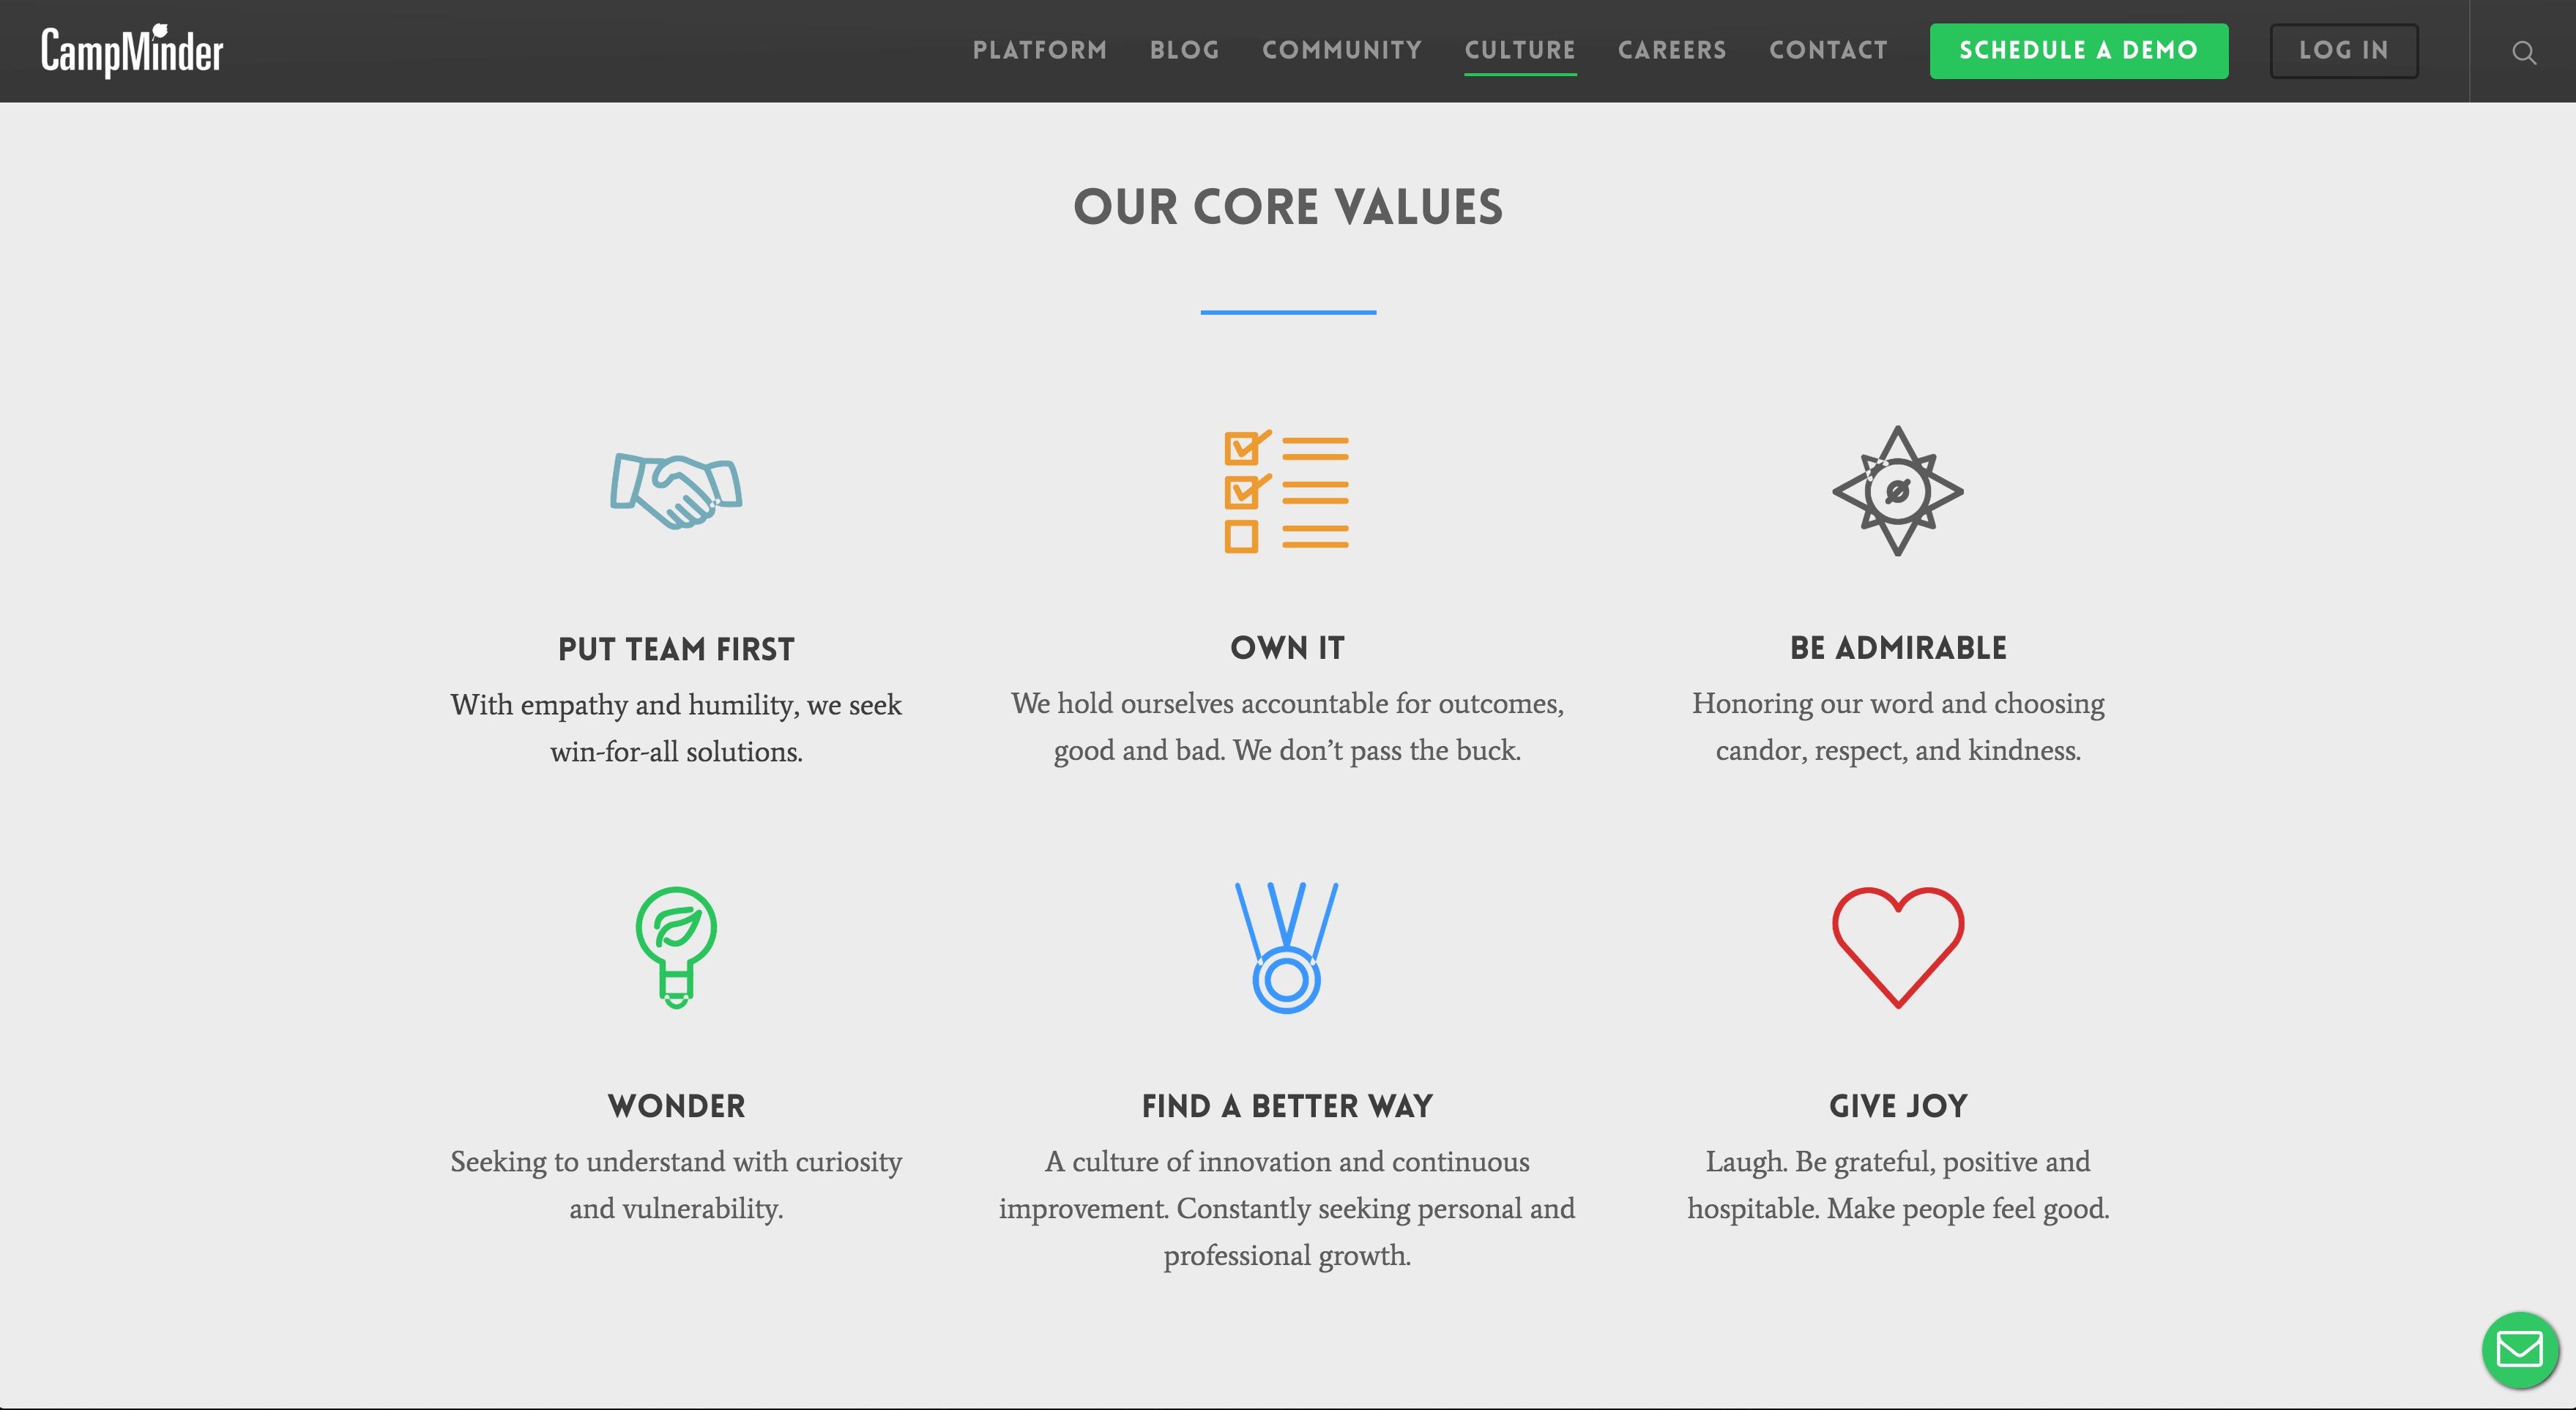 CampMinder Demo - CampMinder Company Values